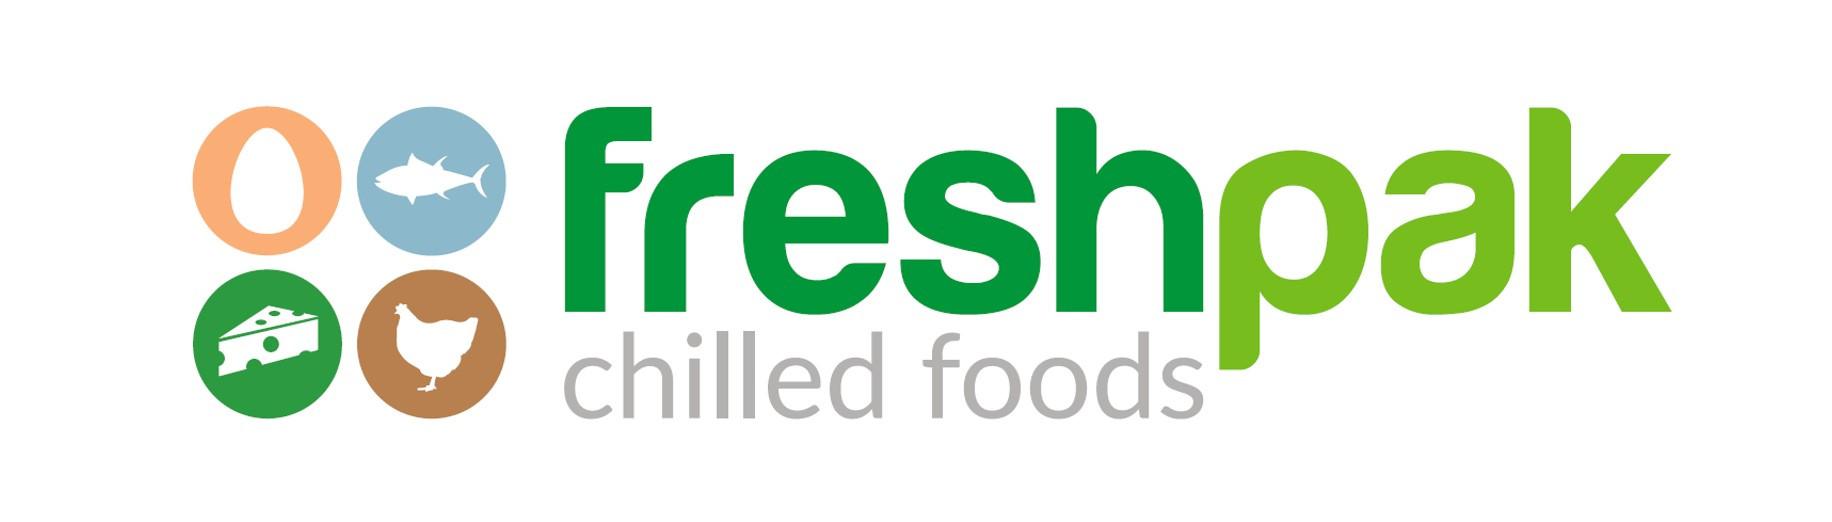 210406 Freshpak logo.jpg